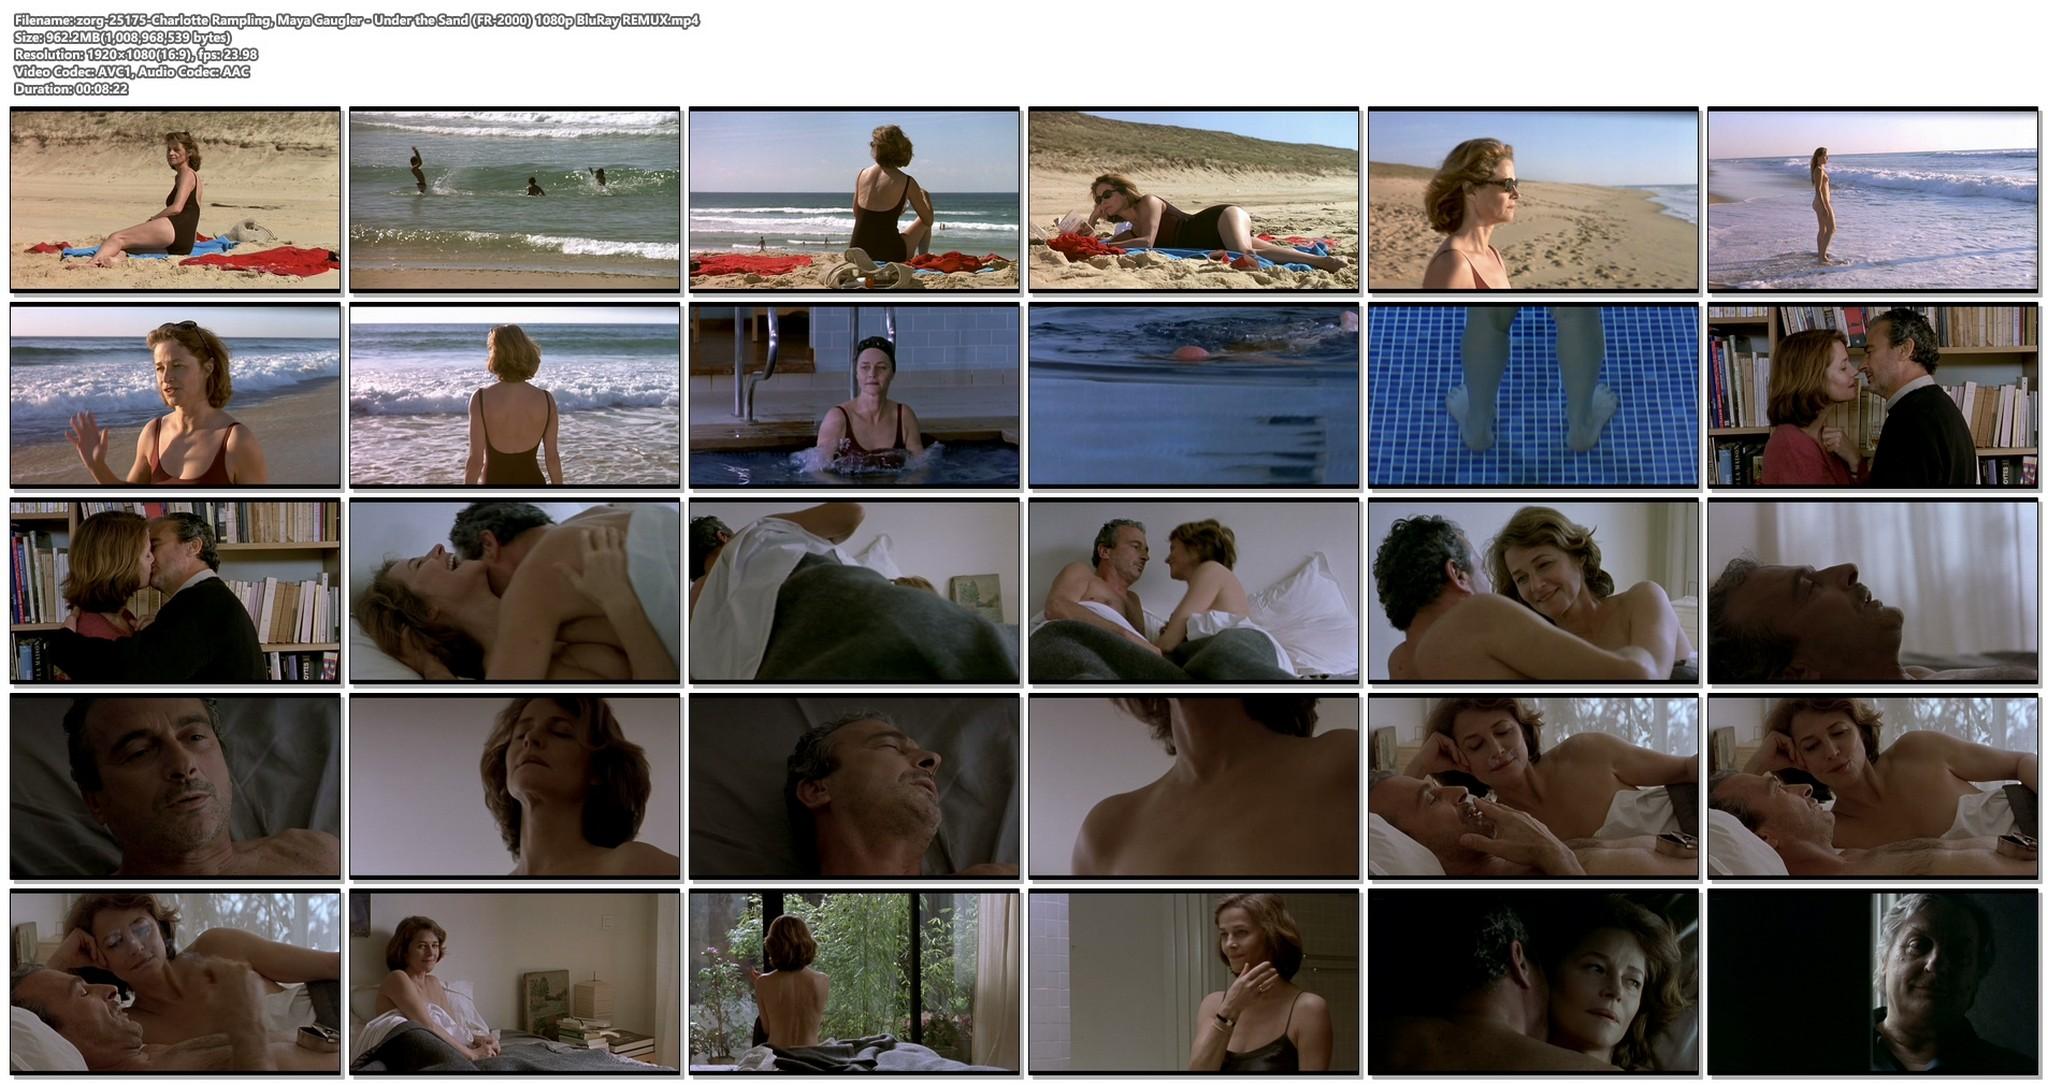 Charlotte Rampling nude sex Maya Gaugler nude full frontal Under the Sand FR 2000 1080p BluRay REMUX 12